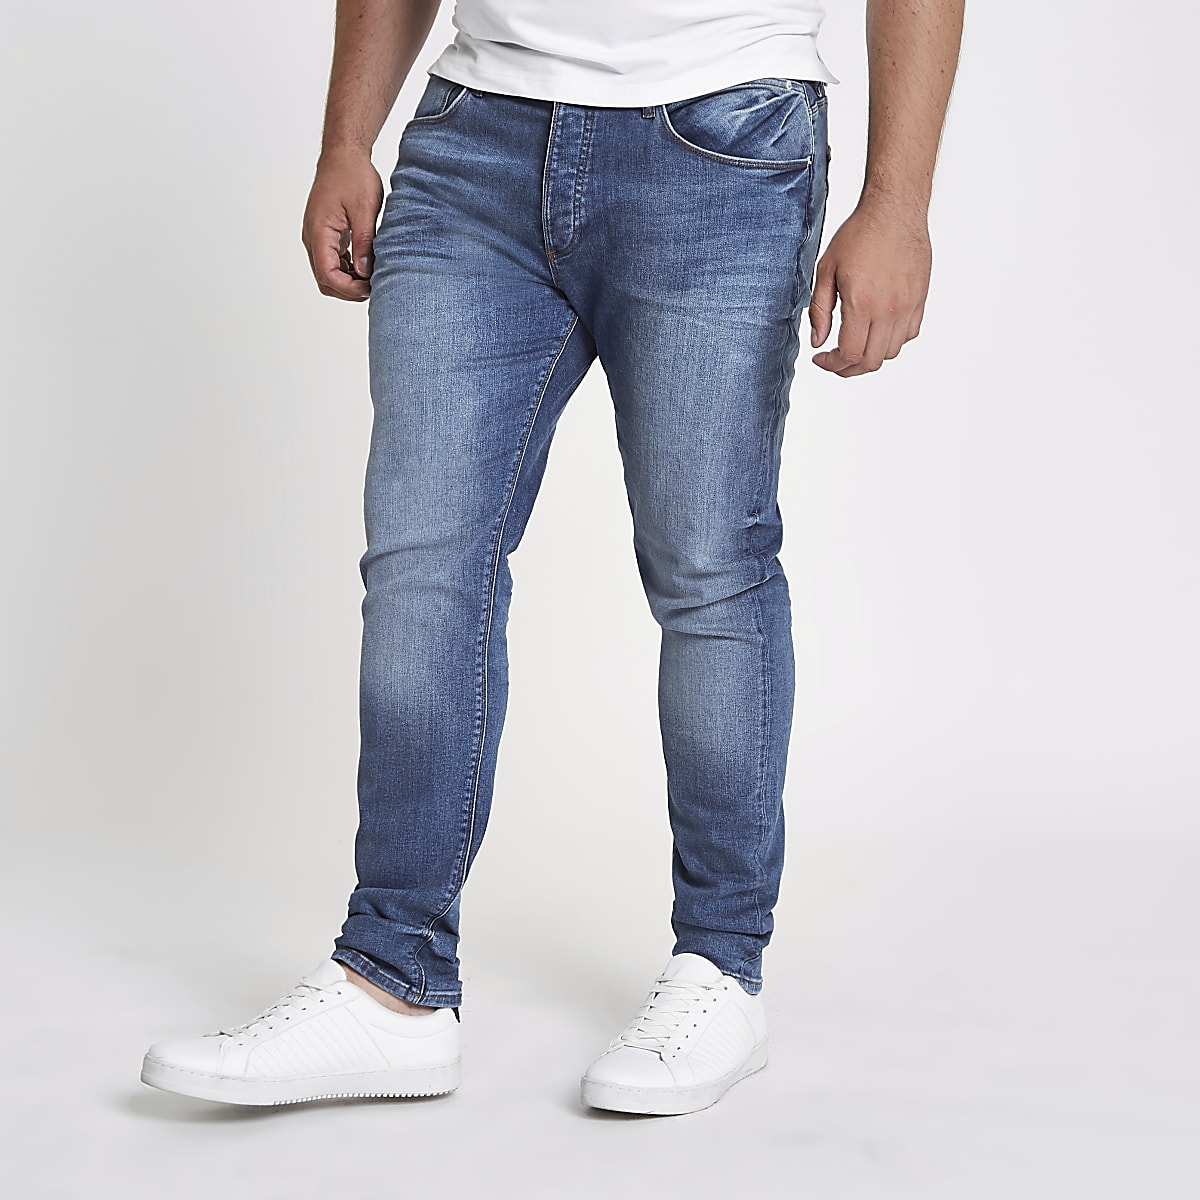 RI Big and Tall - Sid - Middenblauwe wash skinny jeans